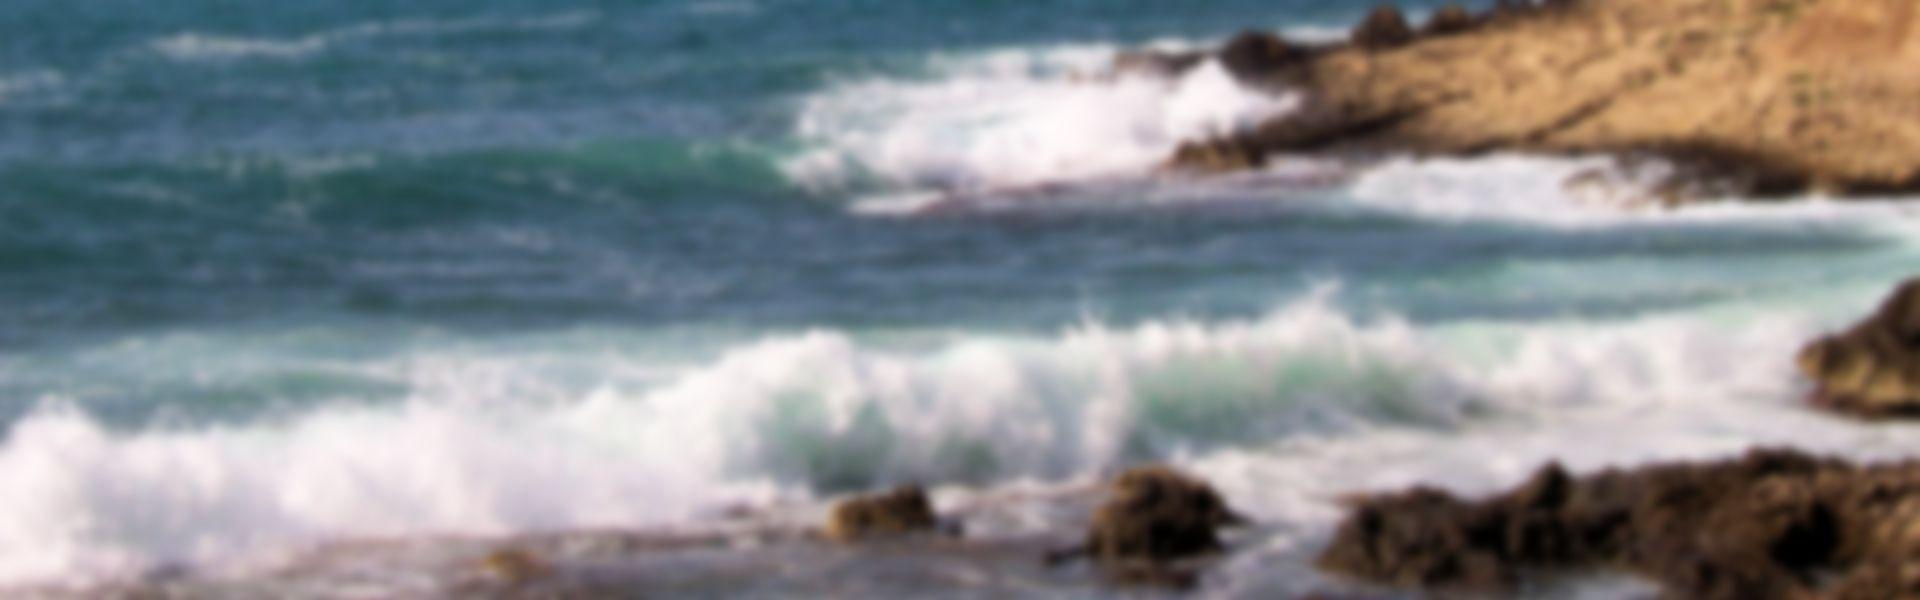 info-slide-4-g-blurred